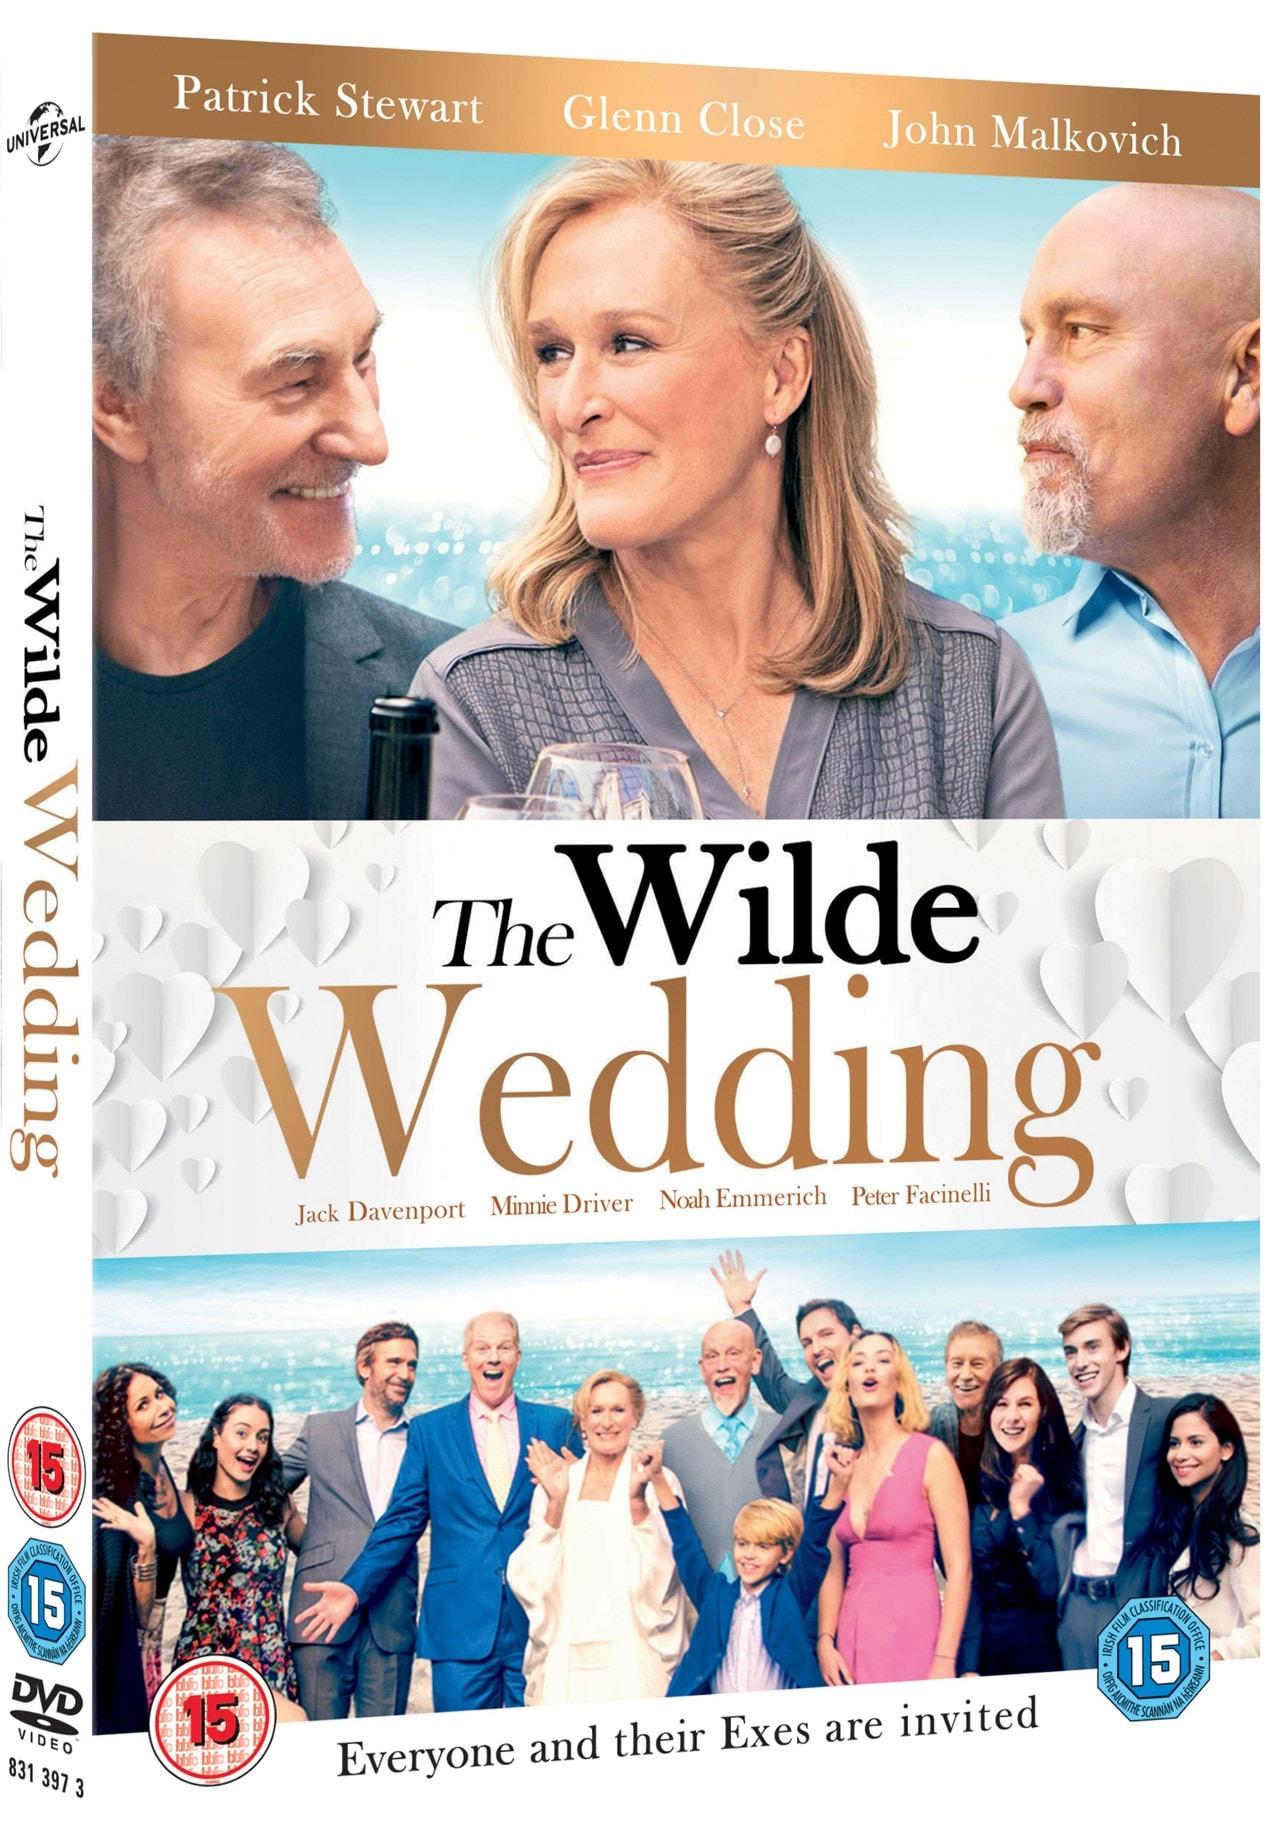 The Wilde Wedding - 2